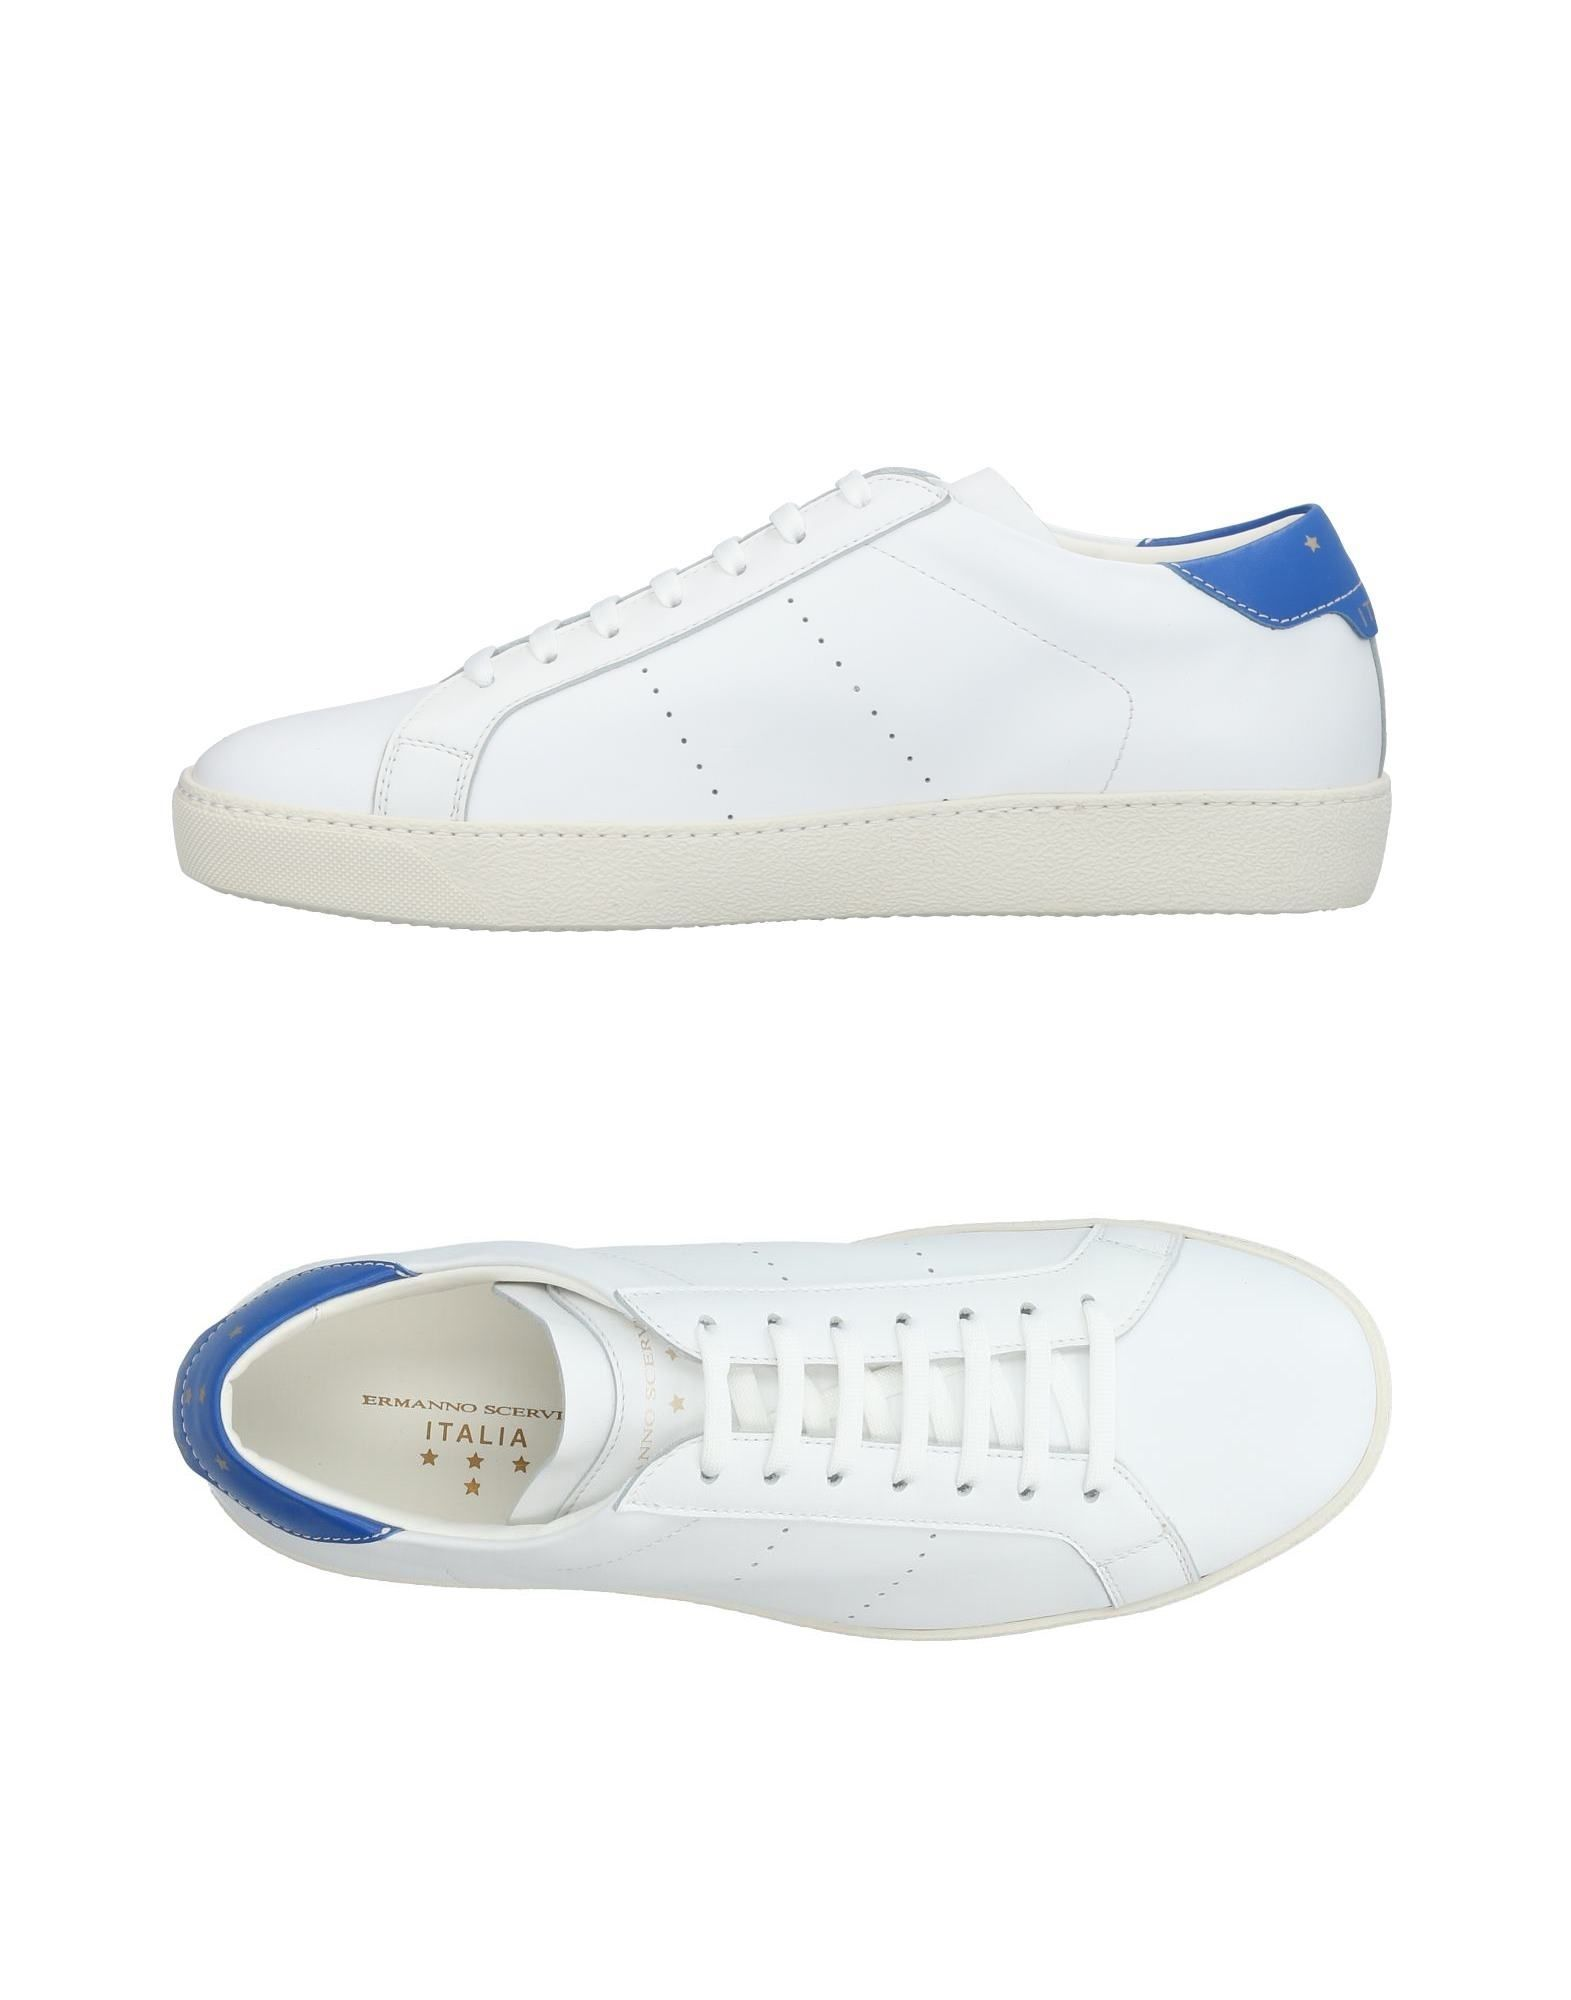 Sneakers Ermanno Scervino Uomo - 11442470TK